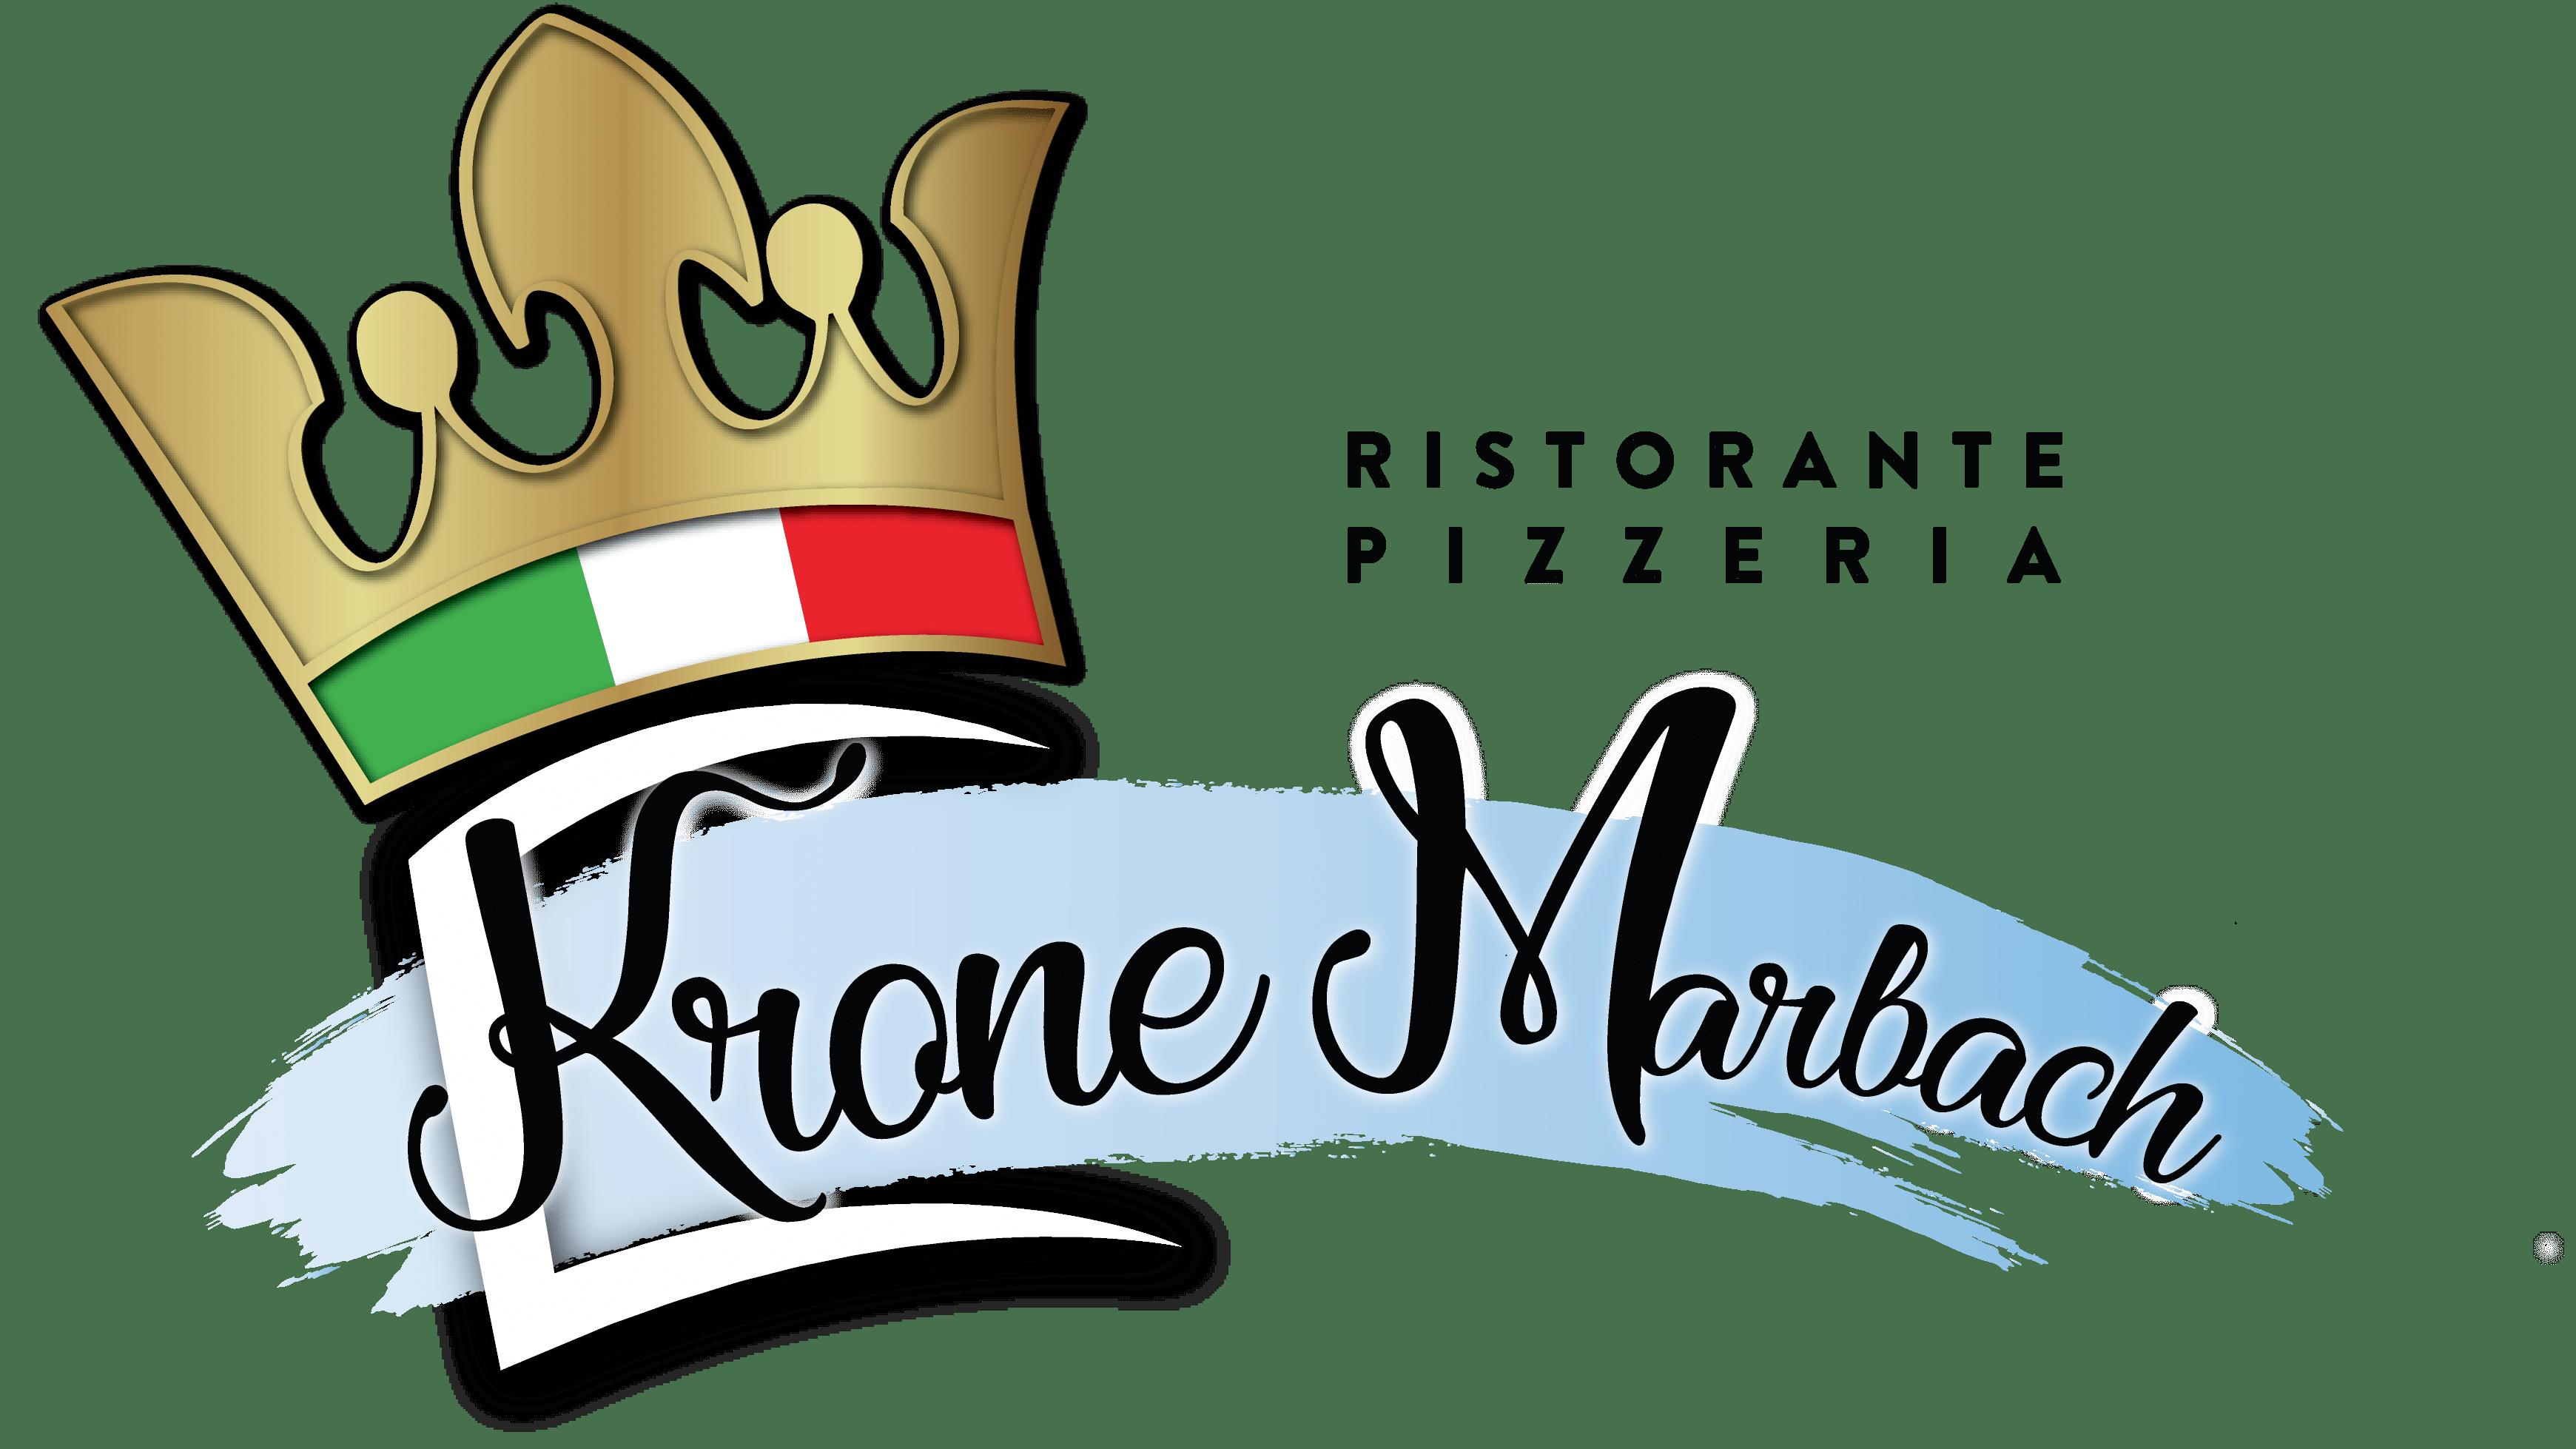 KroneMarbach_Logo